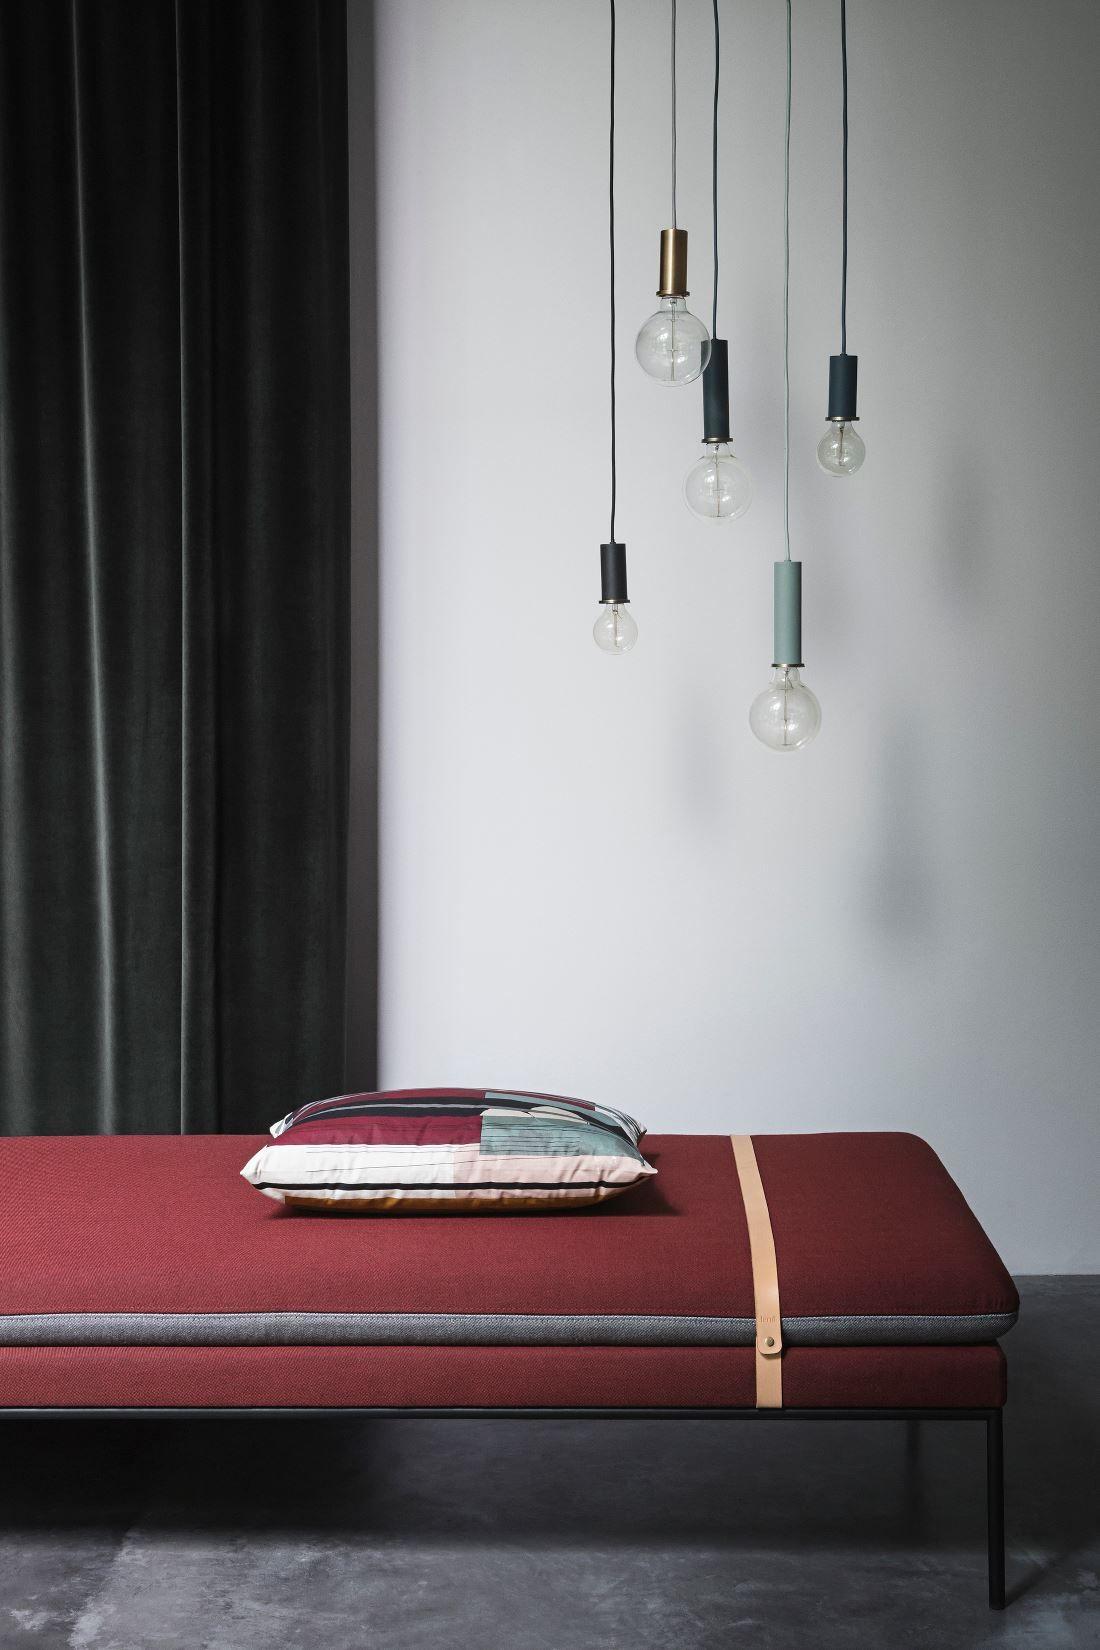 Modern Pendant Lamps For Bedroom Living Room Find Inspiration Supplies For Diy Lamps At Www I Corner Lighting Living Room Light Fixtures Lamps Living Room